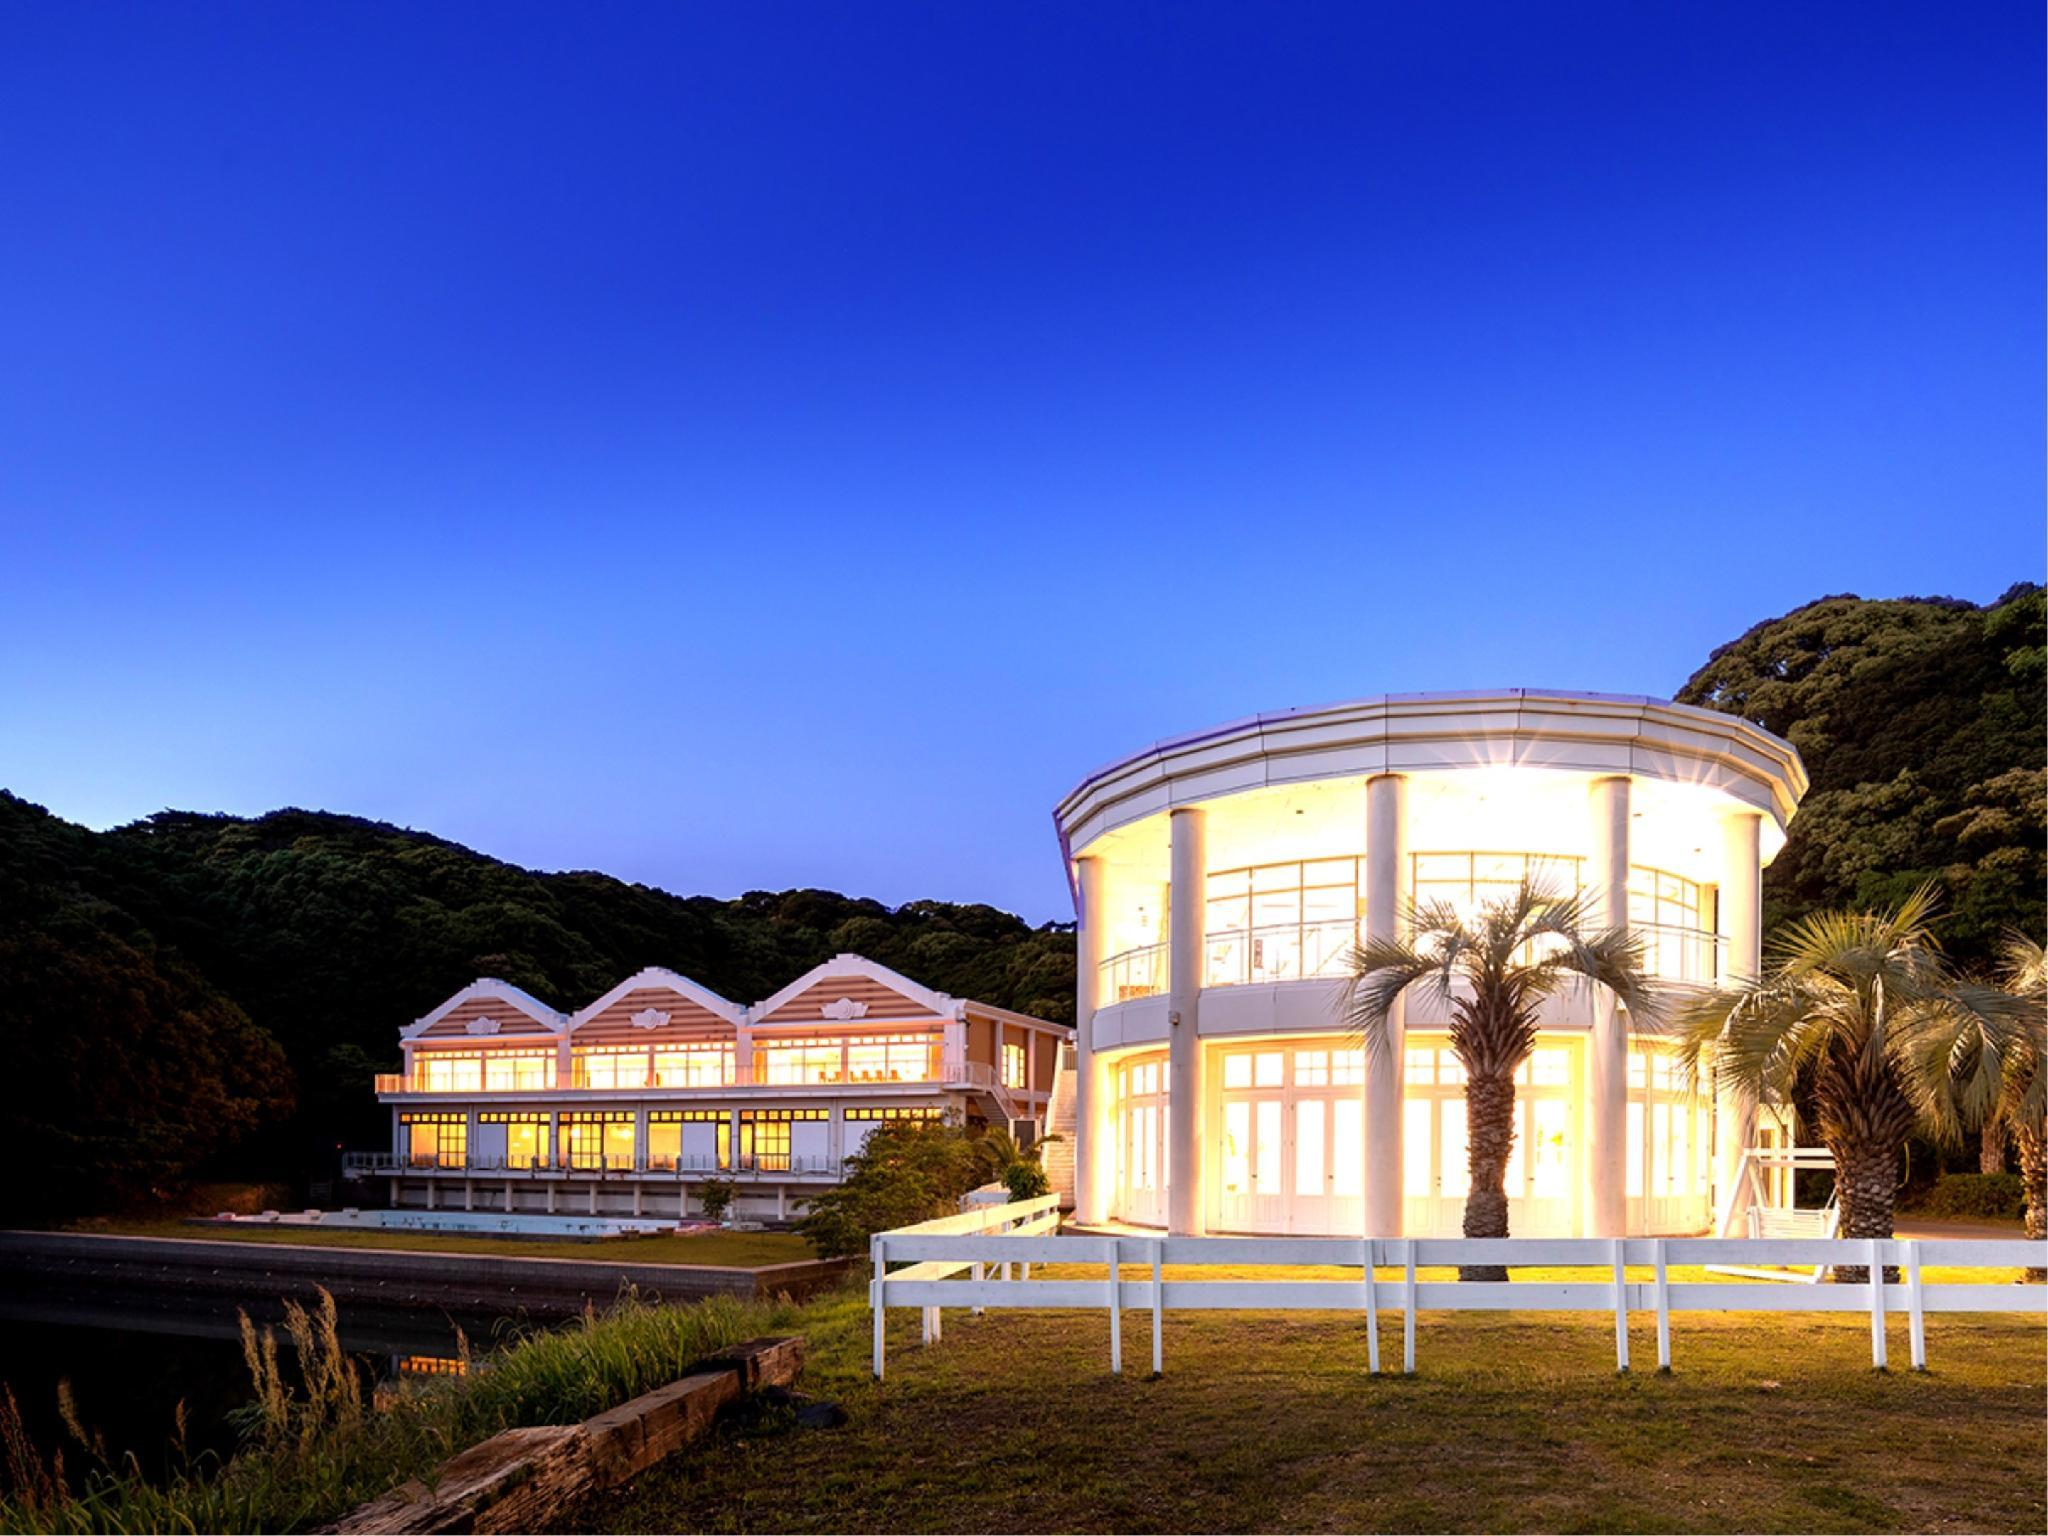 Kujyukushima Seaside Terrace